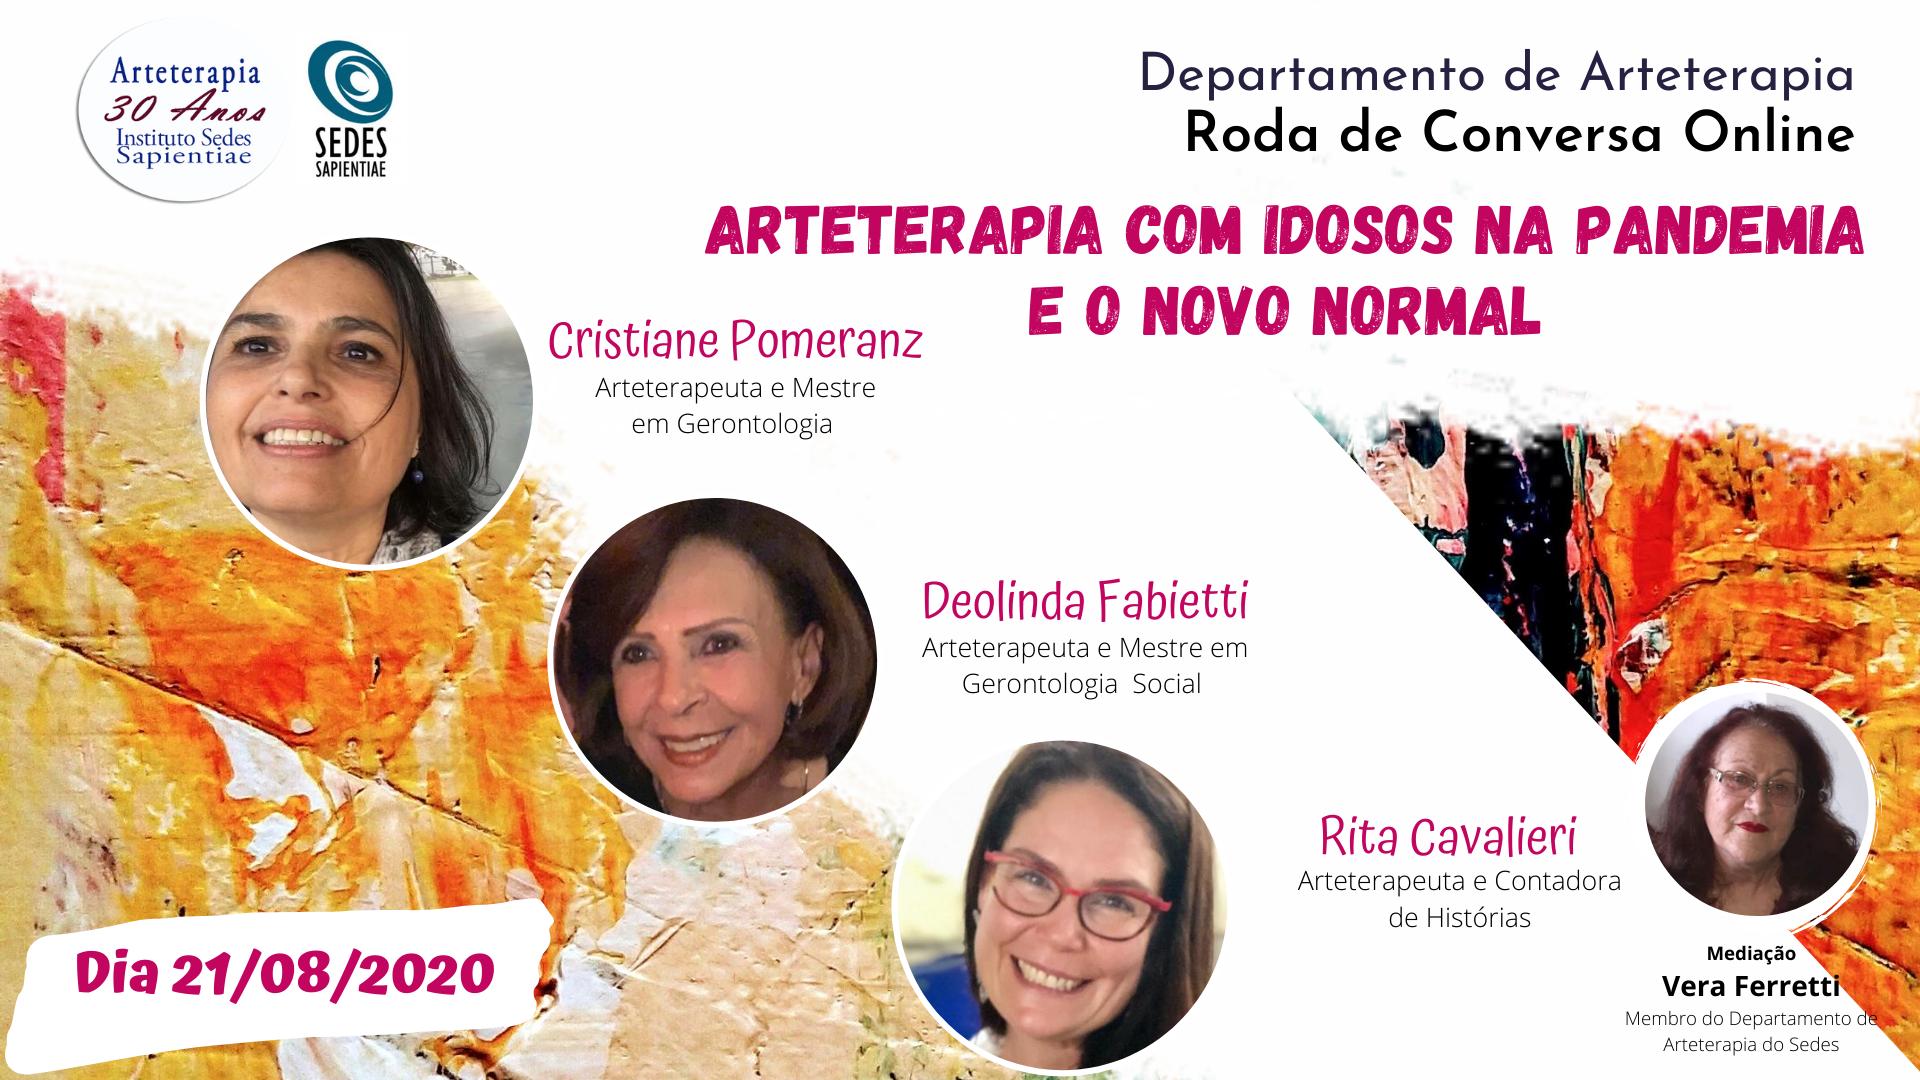 Arteterapia com Idosos na Pandemia e o Novo Normal